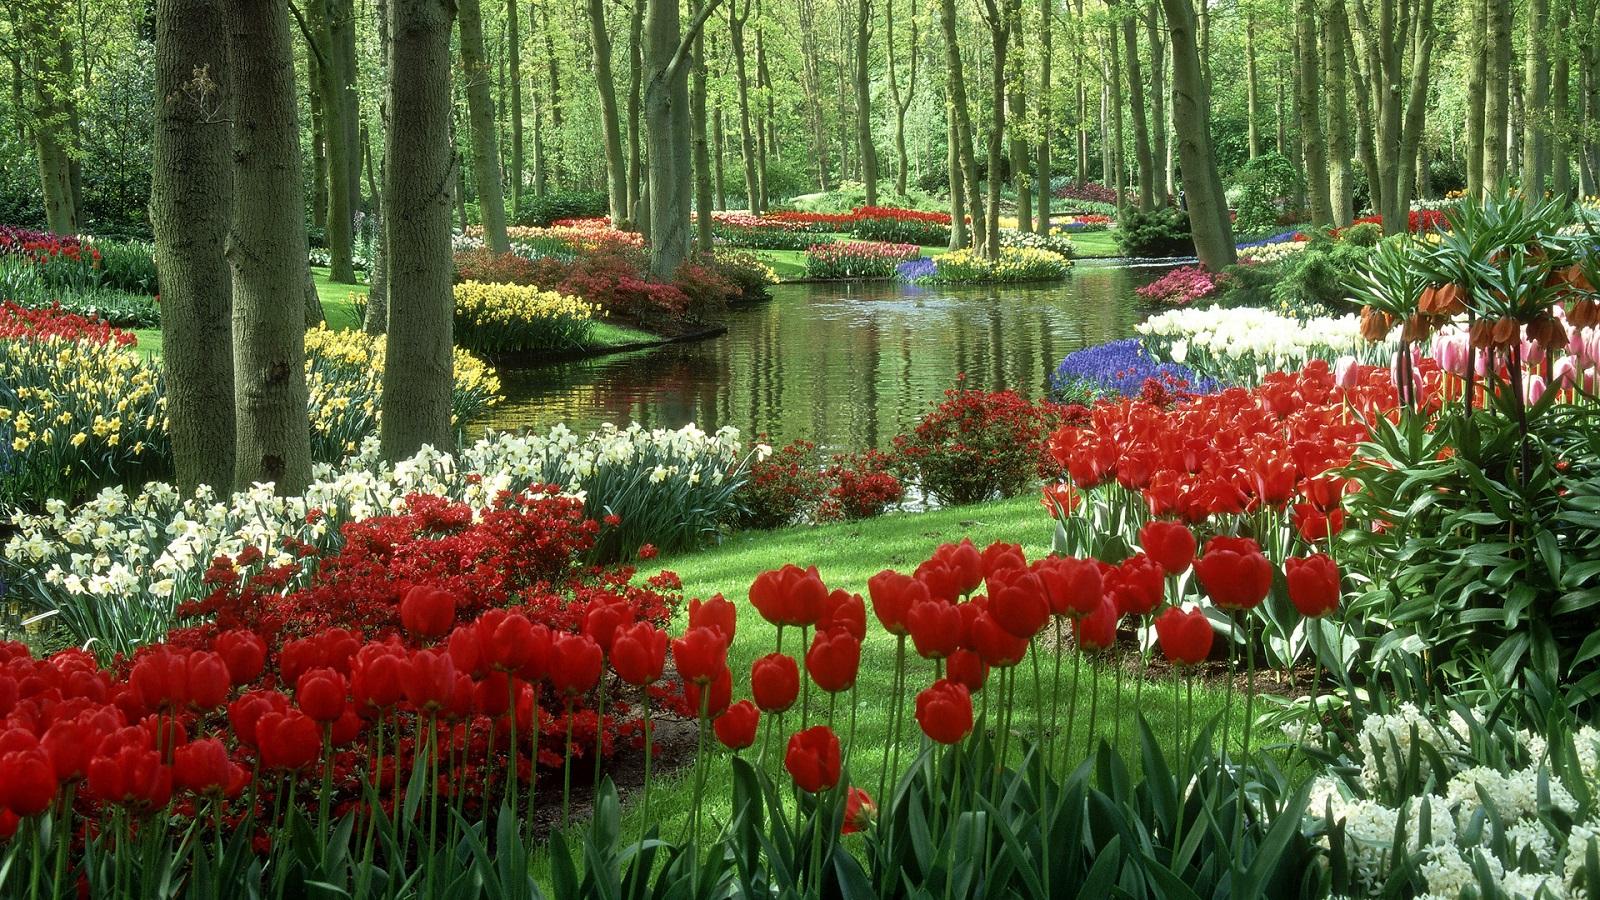 Perfect Spring Holiday, The Netherlands, Keukenhof Gardens, Flowers  Arranged Garden .